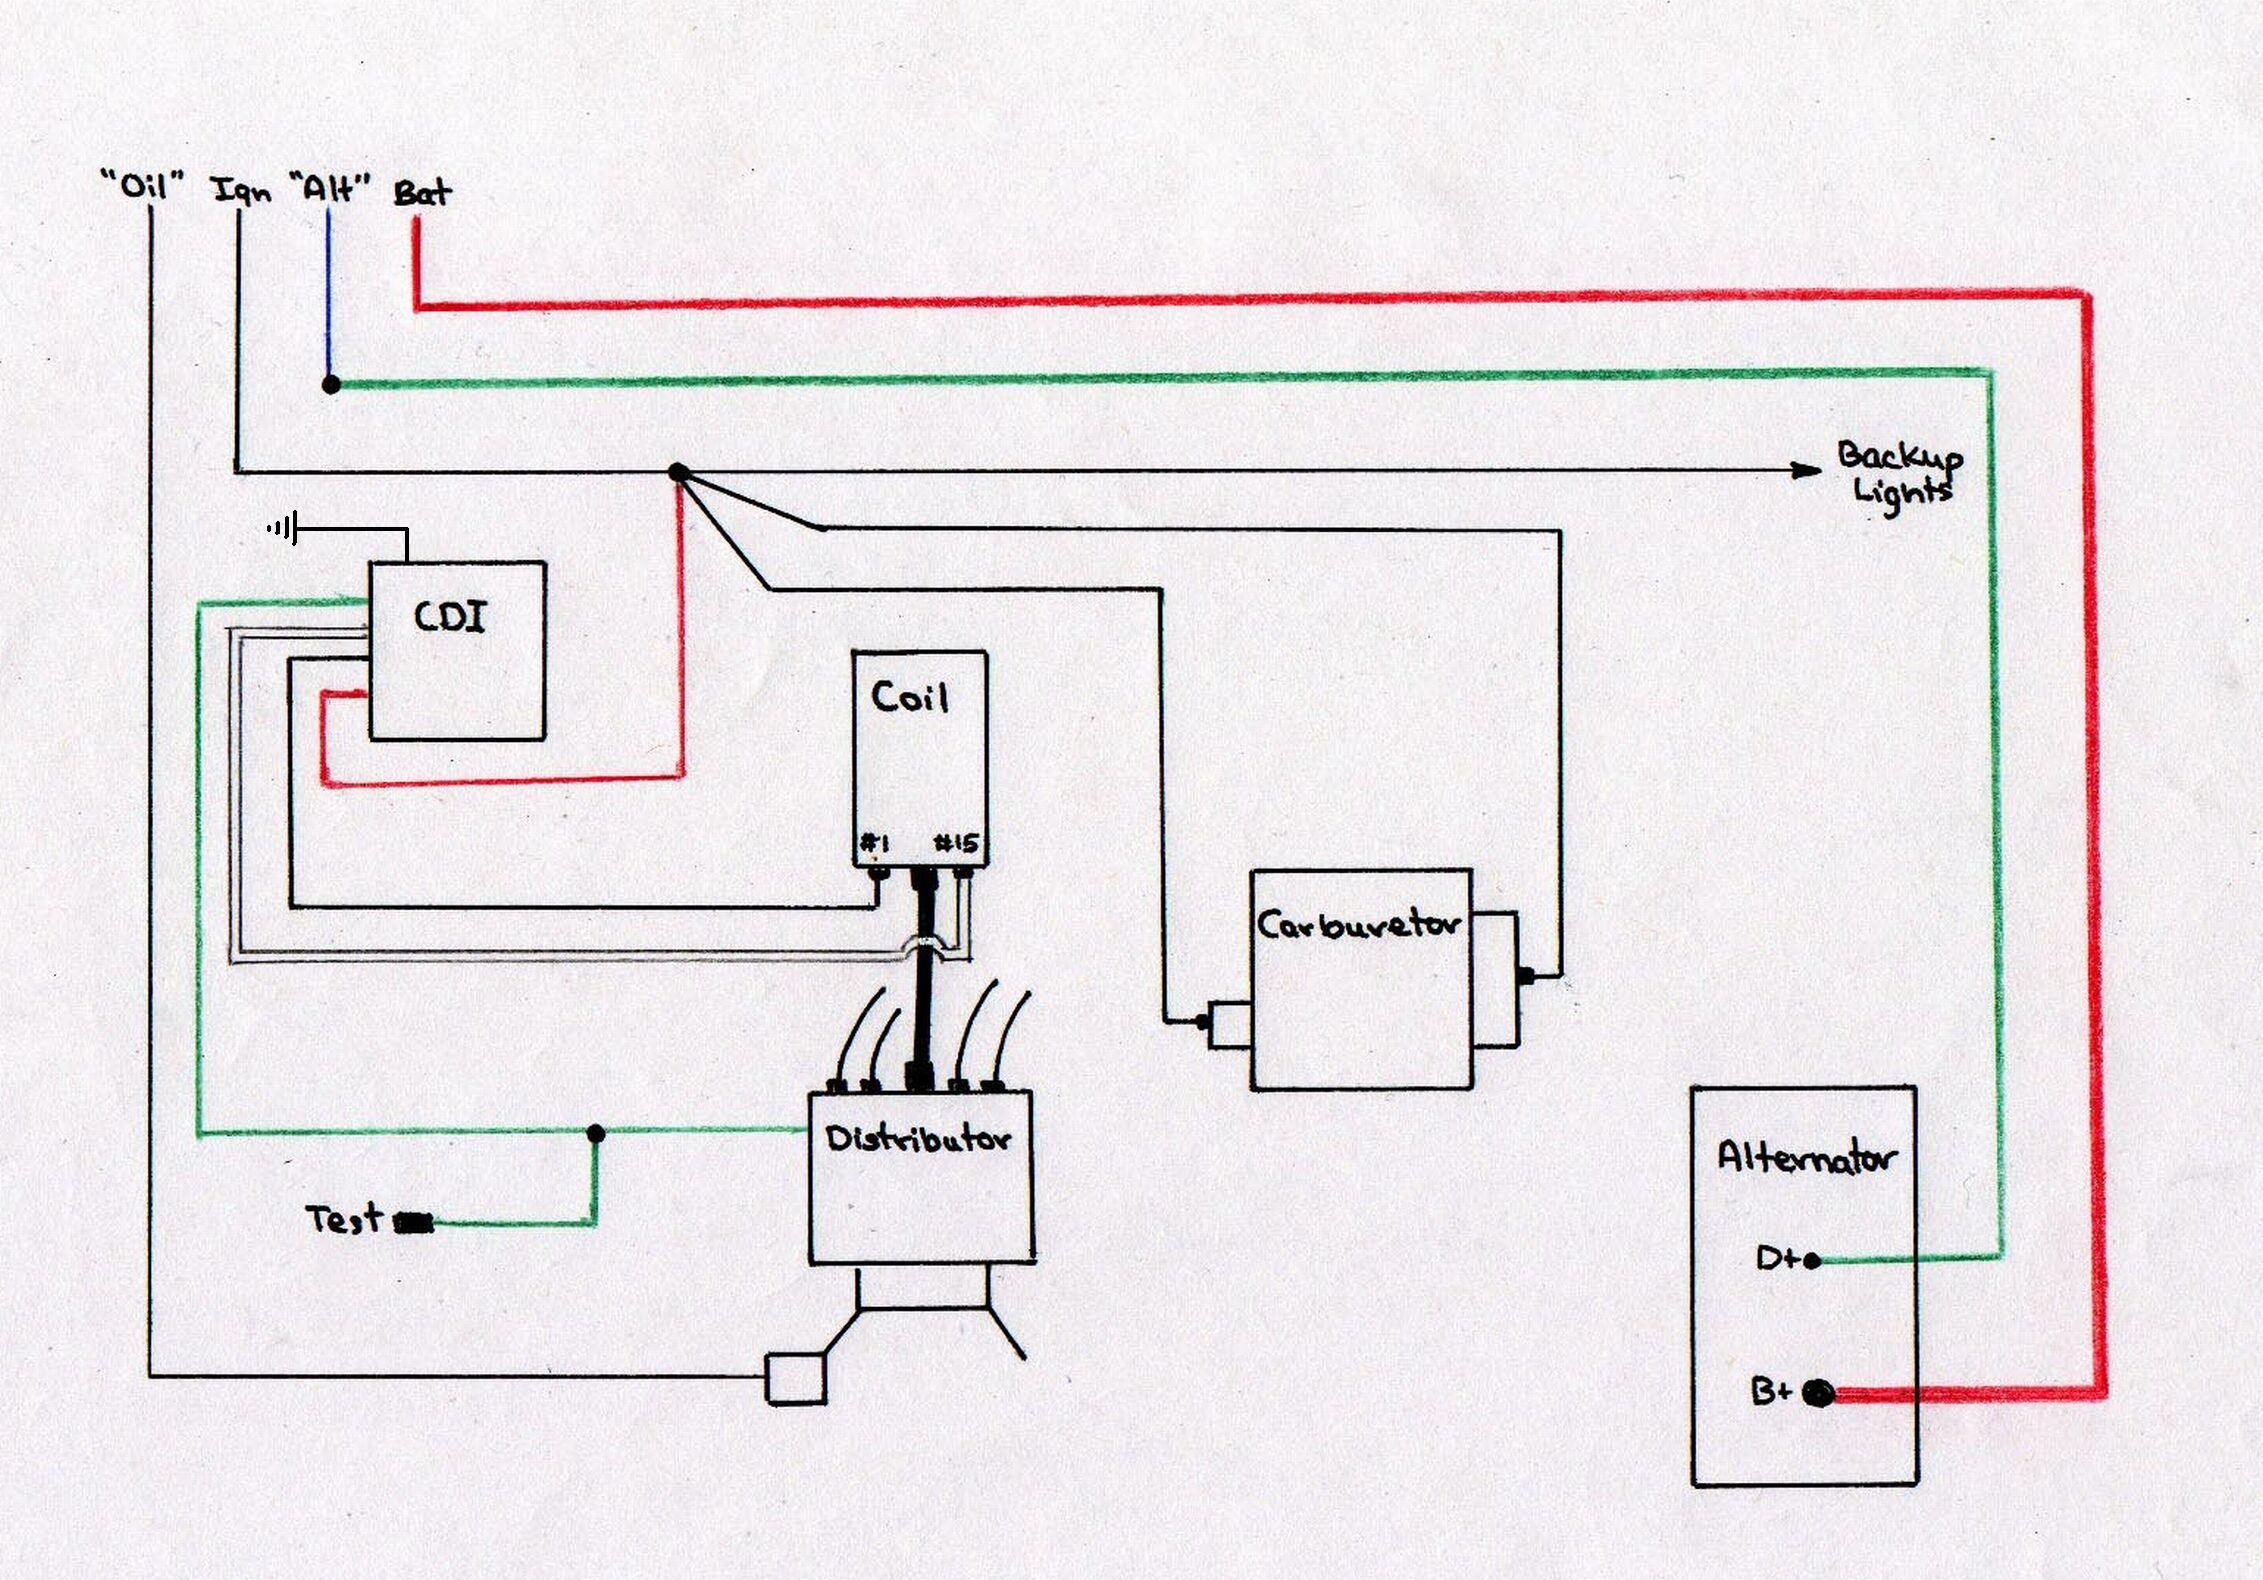 bmx atv parts wiring diagram diy wiring diagrams \u2022 chinese atv parts diagram chinese bmx atv wiring diagram wiring diagrams rh silviaardila co buyang atv wiring diagram red cat